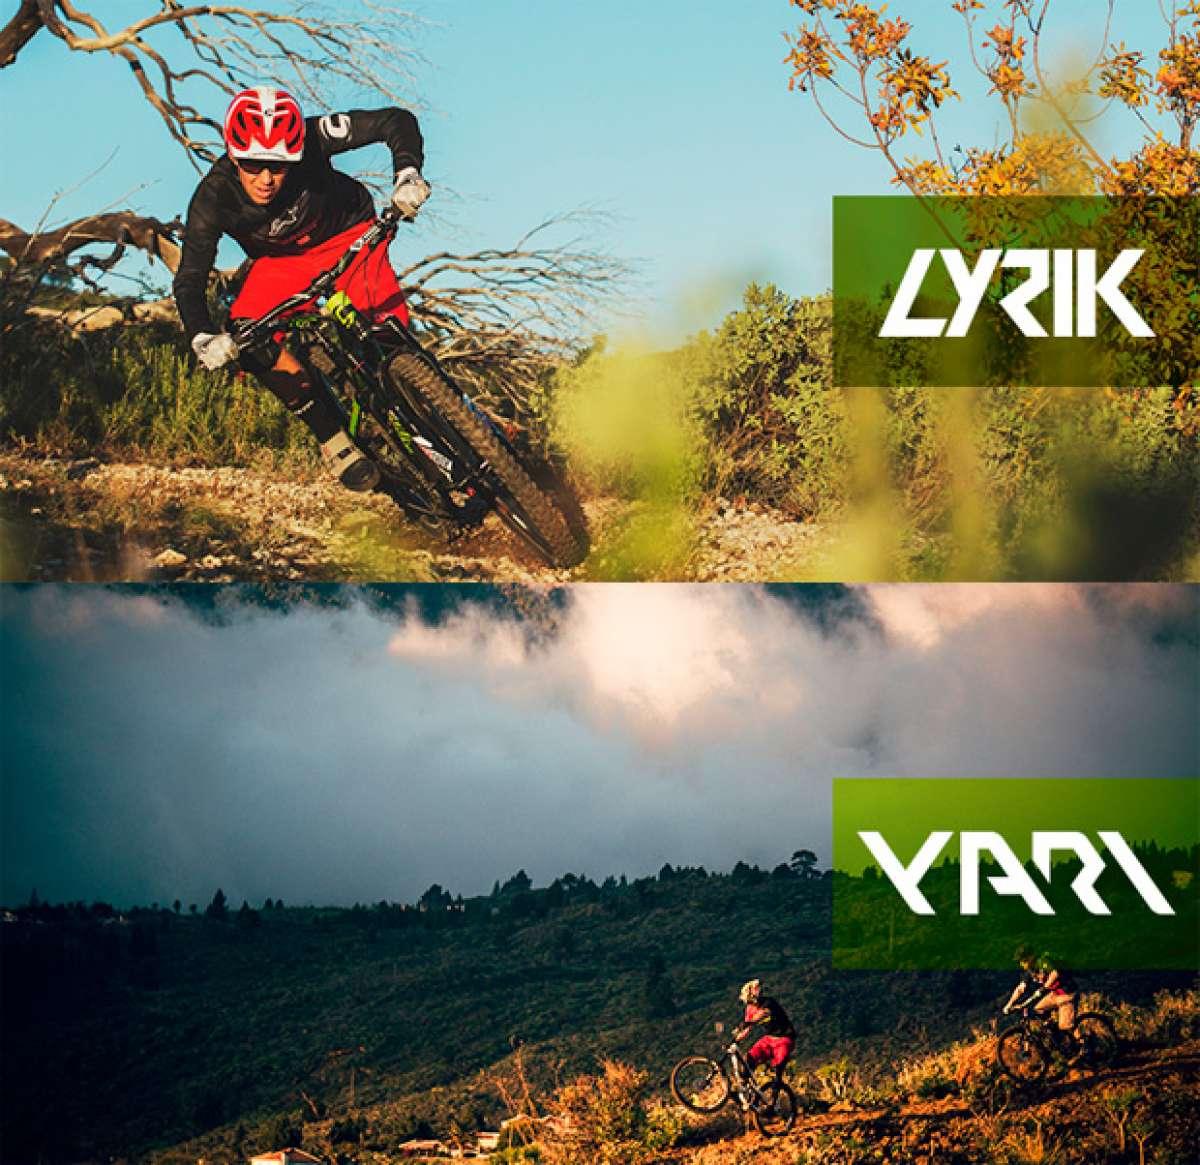 Novedades 2016: Nuevas horquillas RockShox Lyrik (Enduro) y RockShox Yari (Trail/AM)